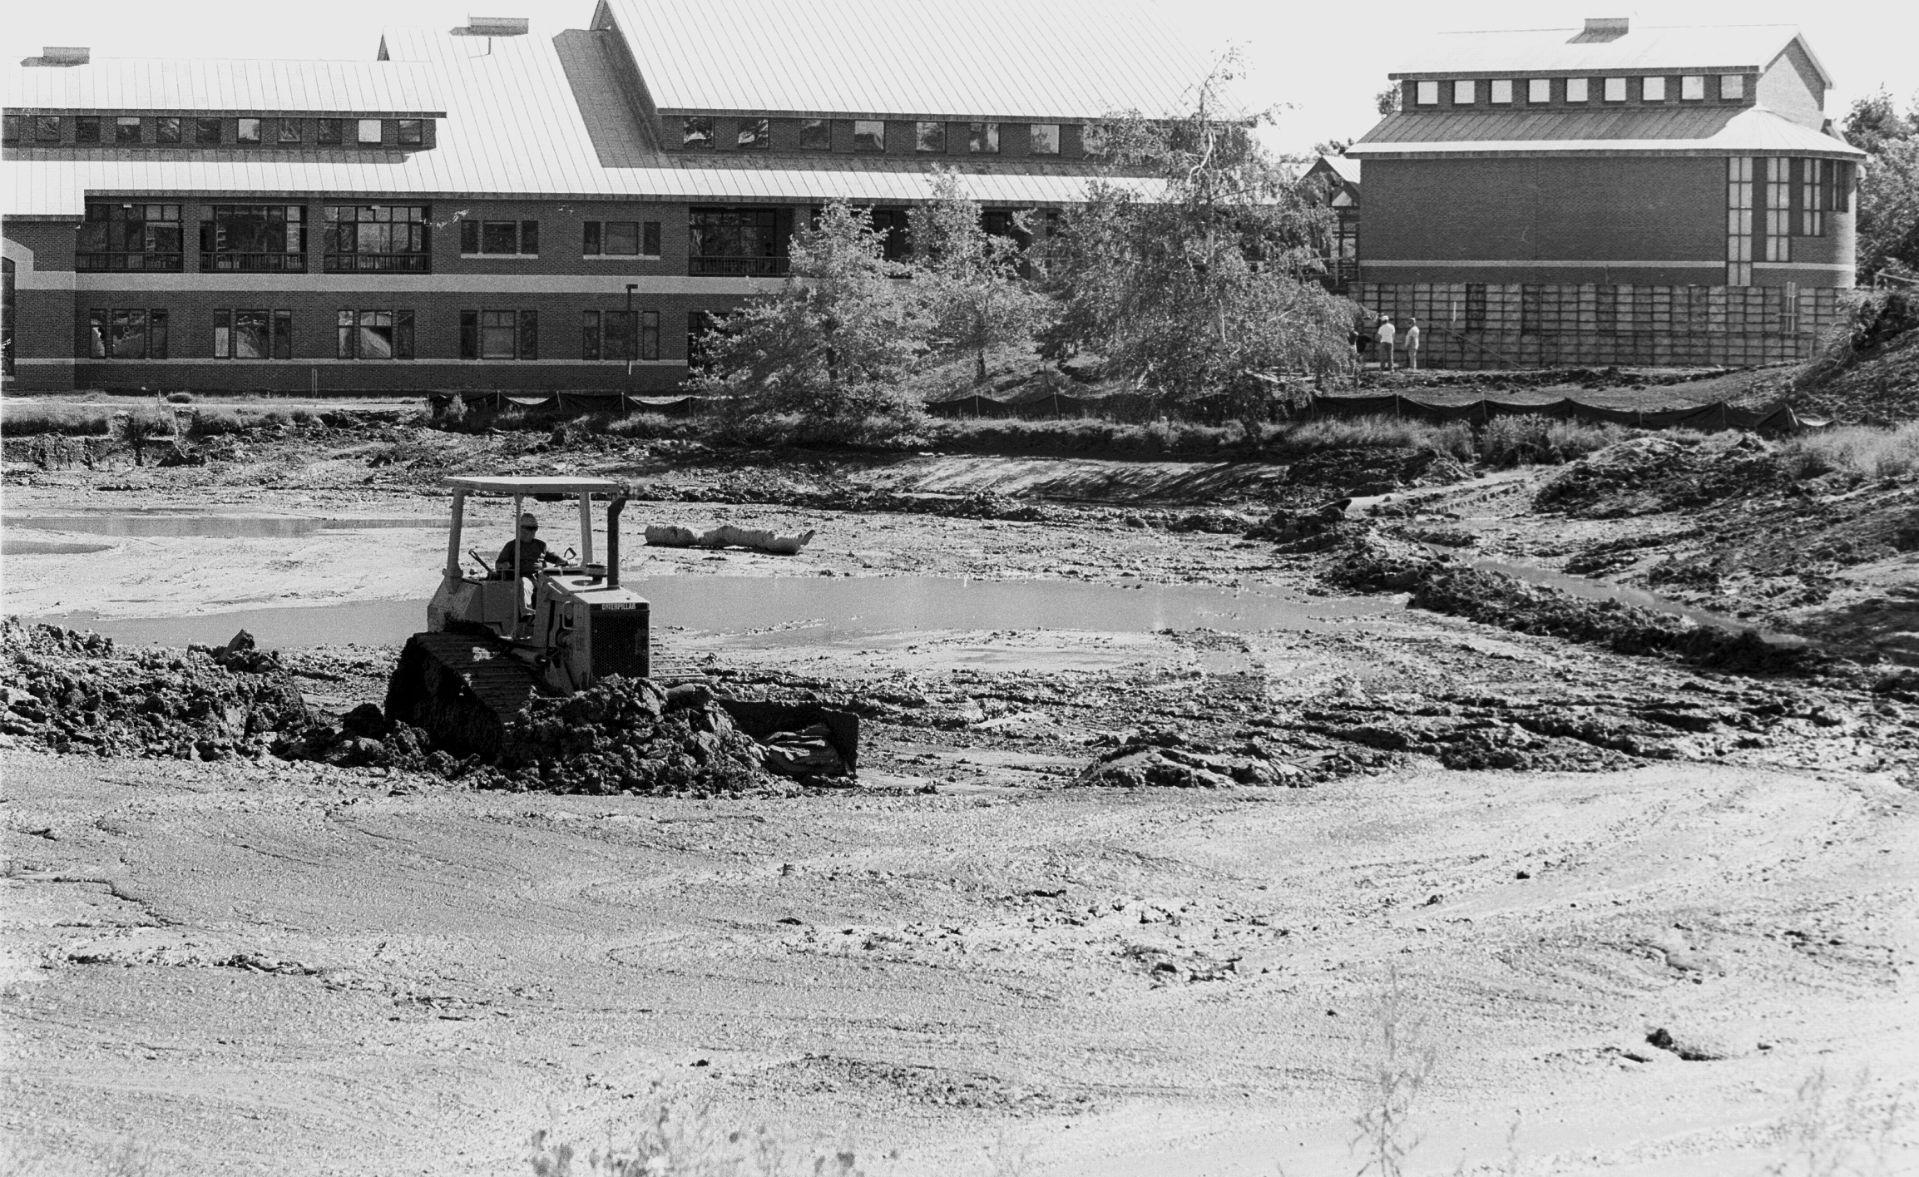 Recalling the 1998 restoration of Lake Andrews | News